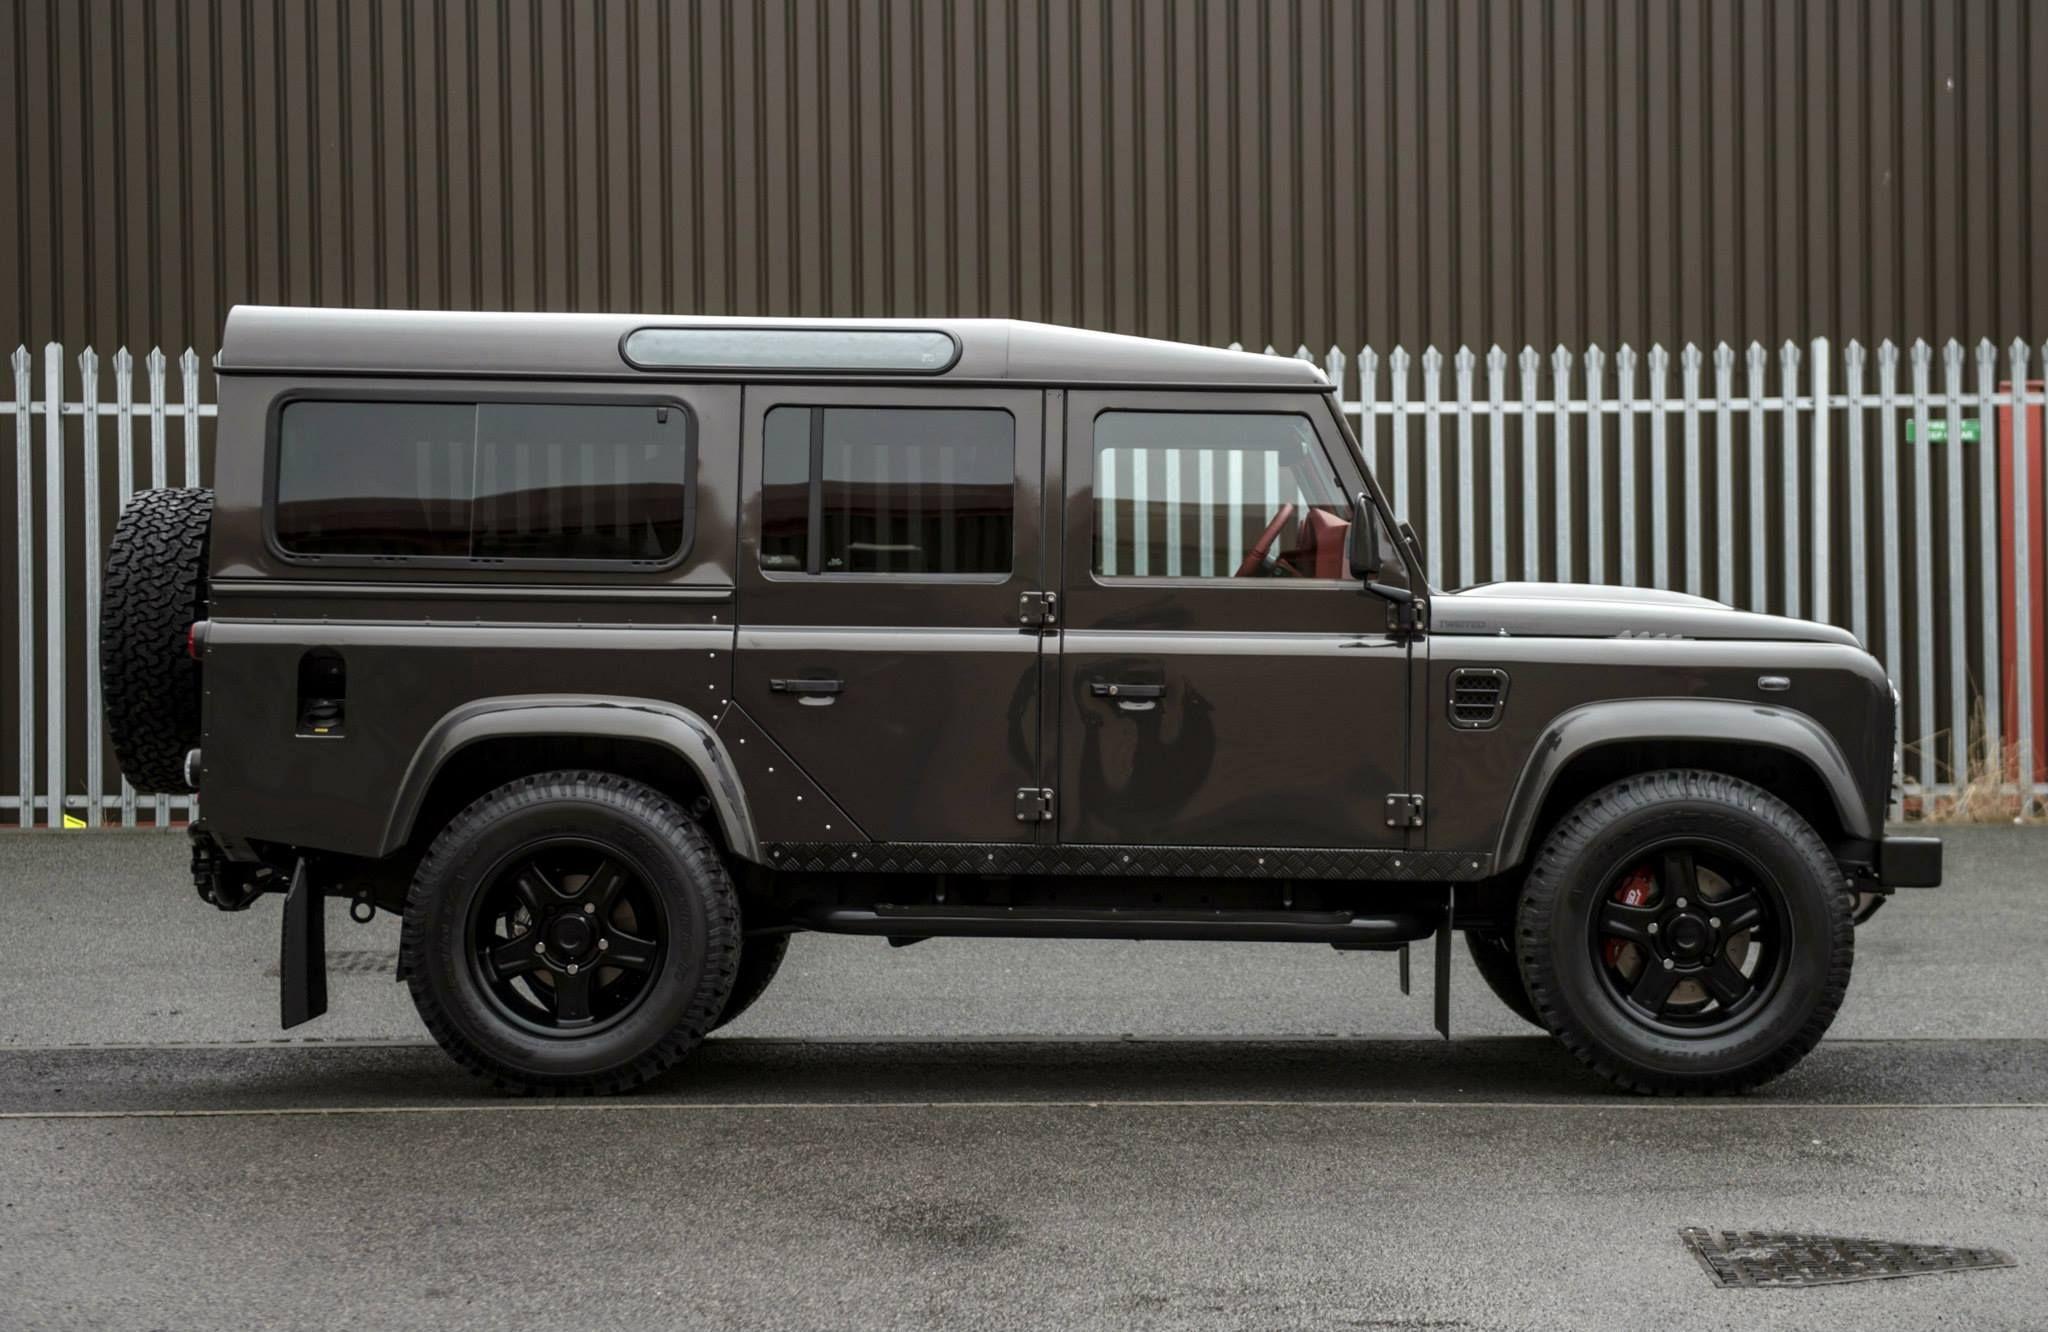 2013 land rover defender by kahn design youtube - Twisted 110 Land Rover Defender Understated Exterior Styling